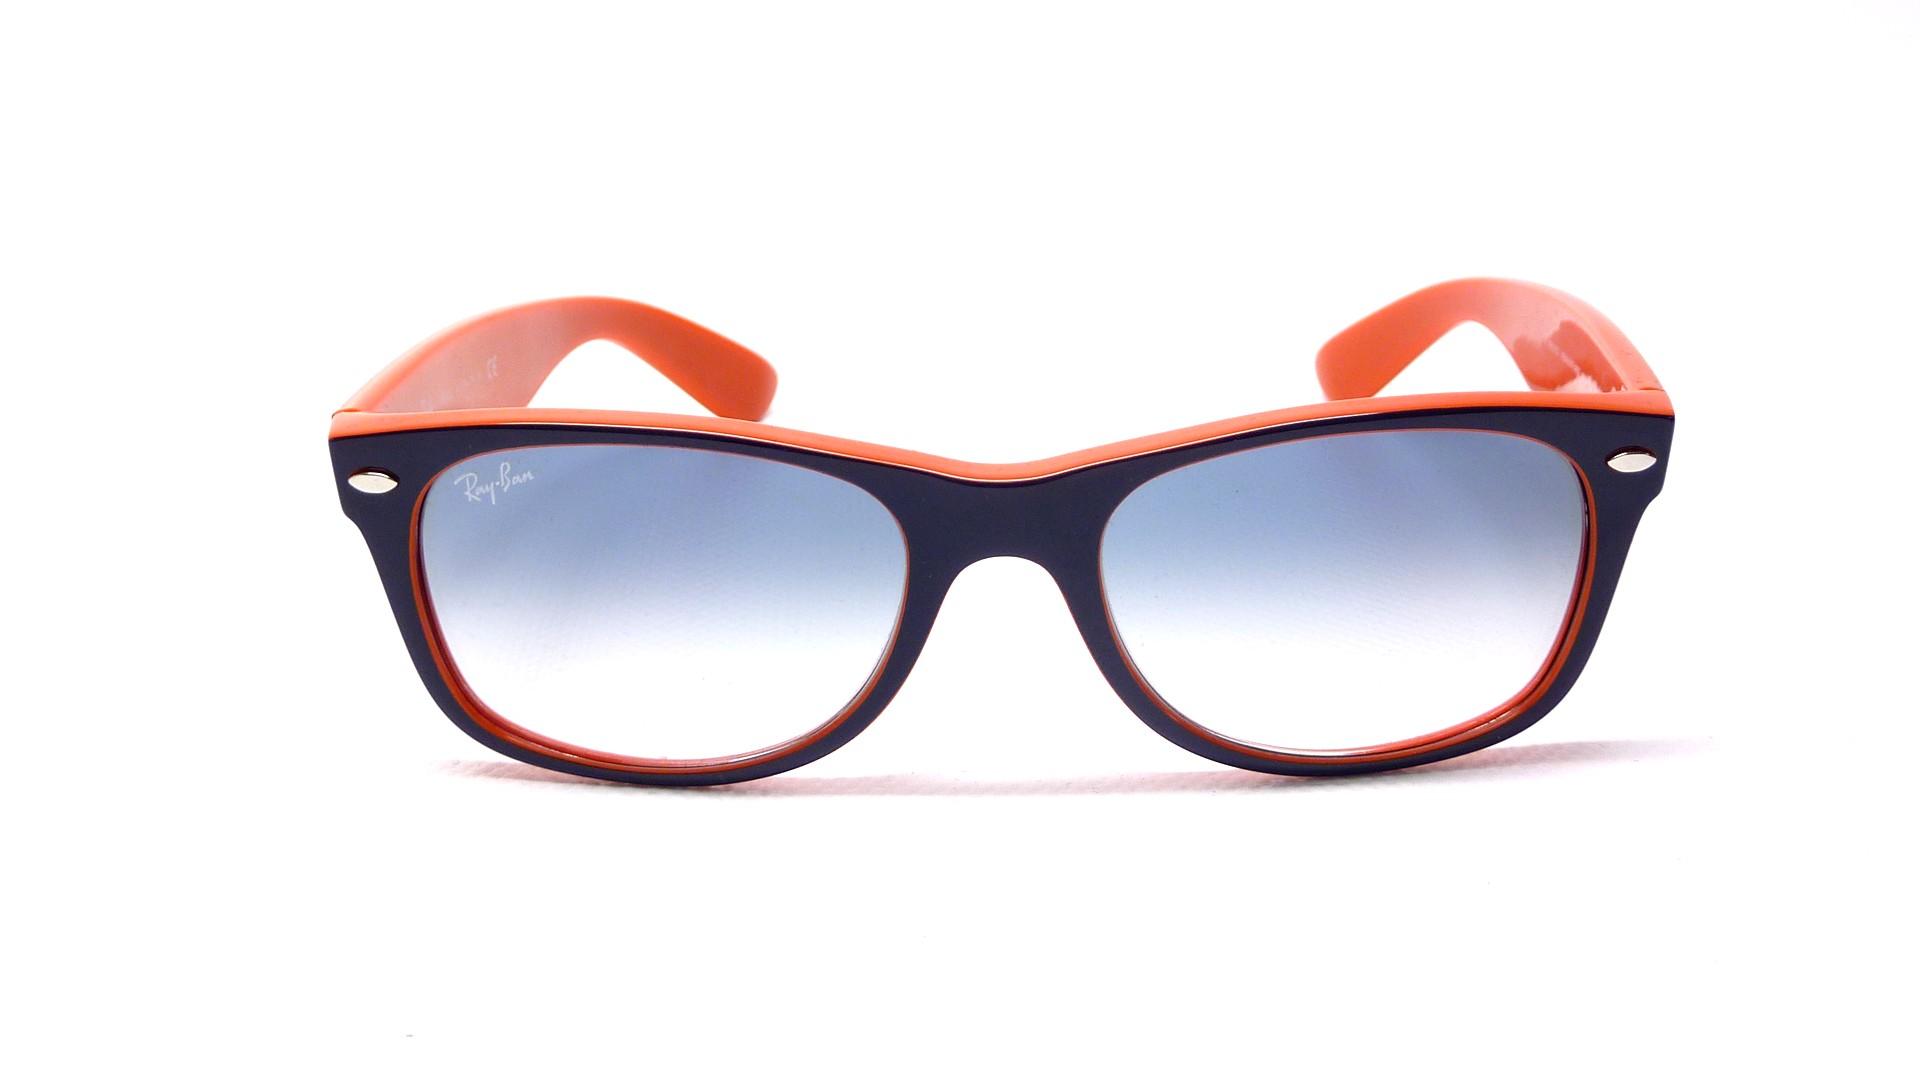 Ray Ban Wayfarer Orange Price « Heritage Malta 0e813746d078